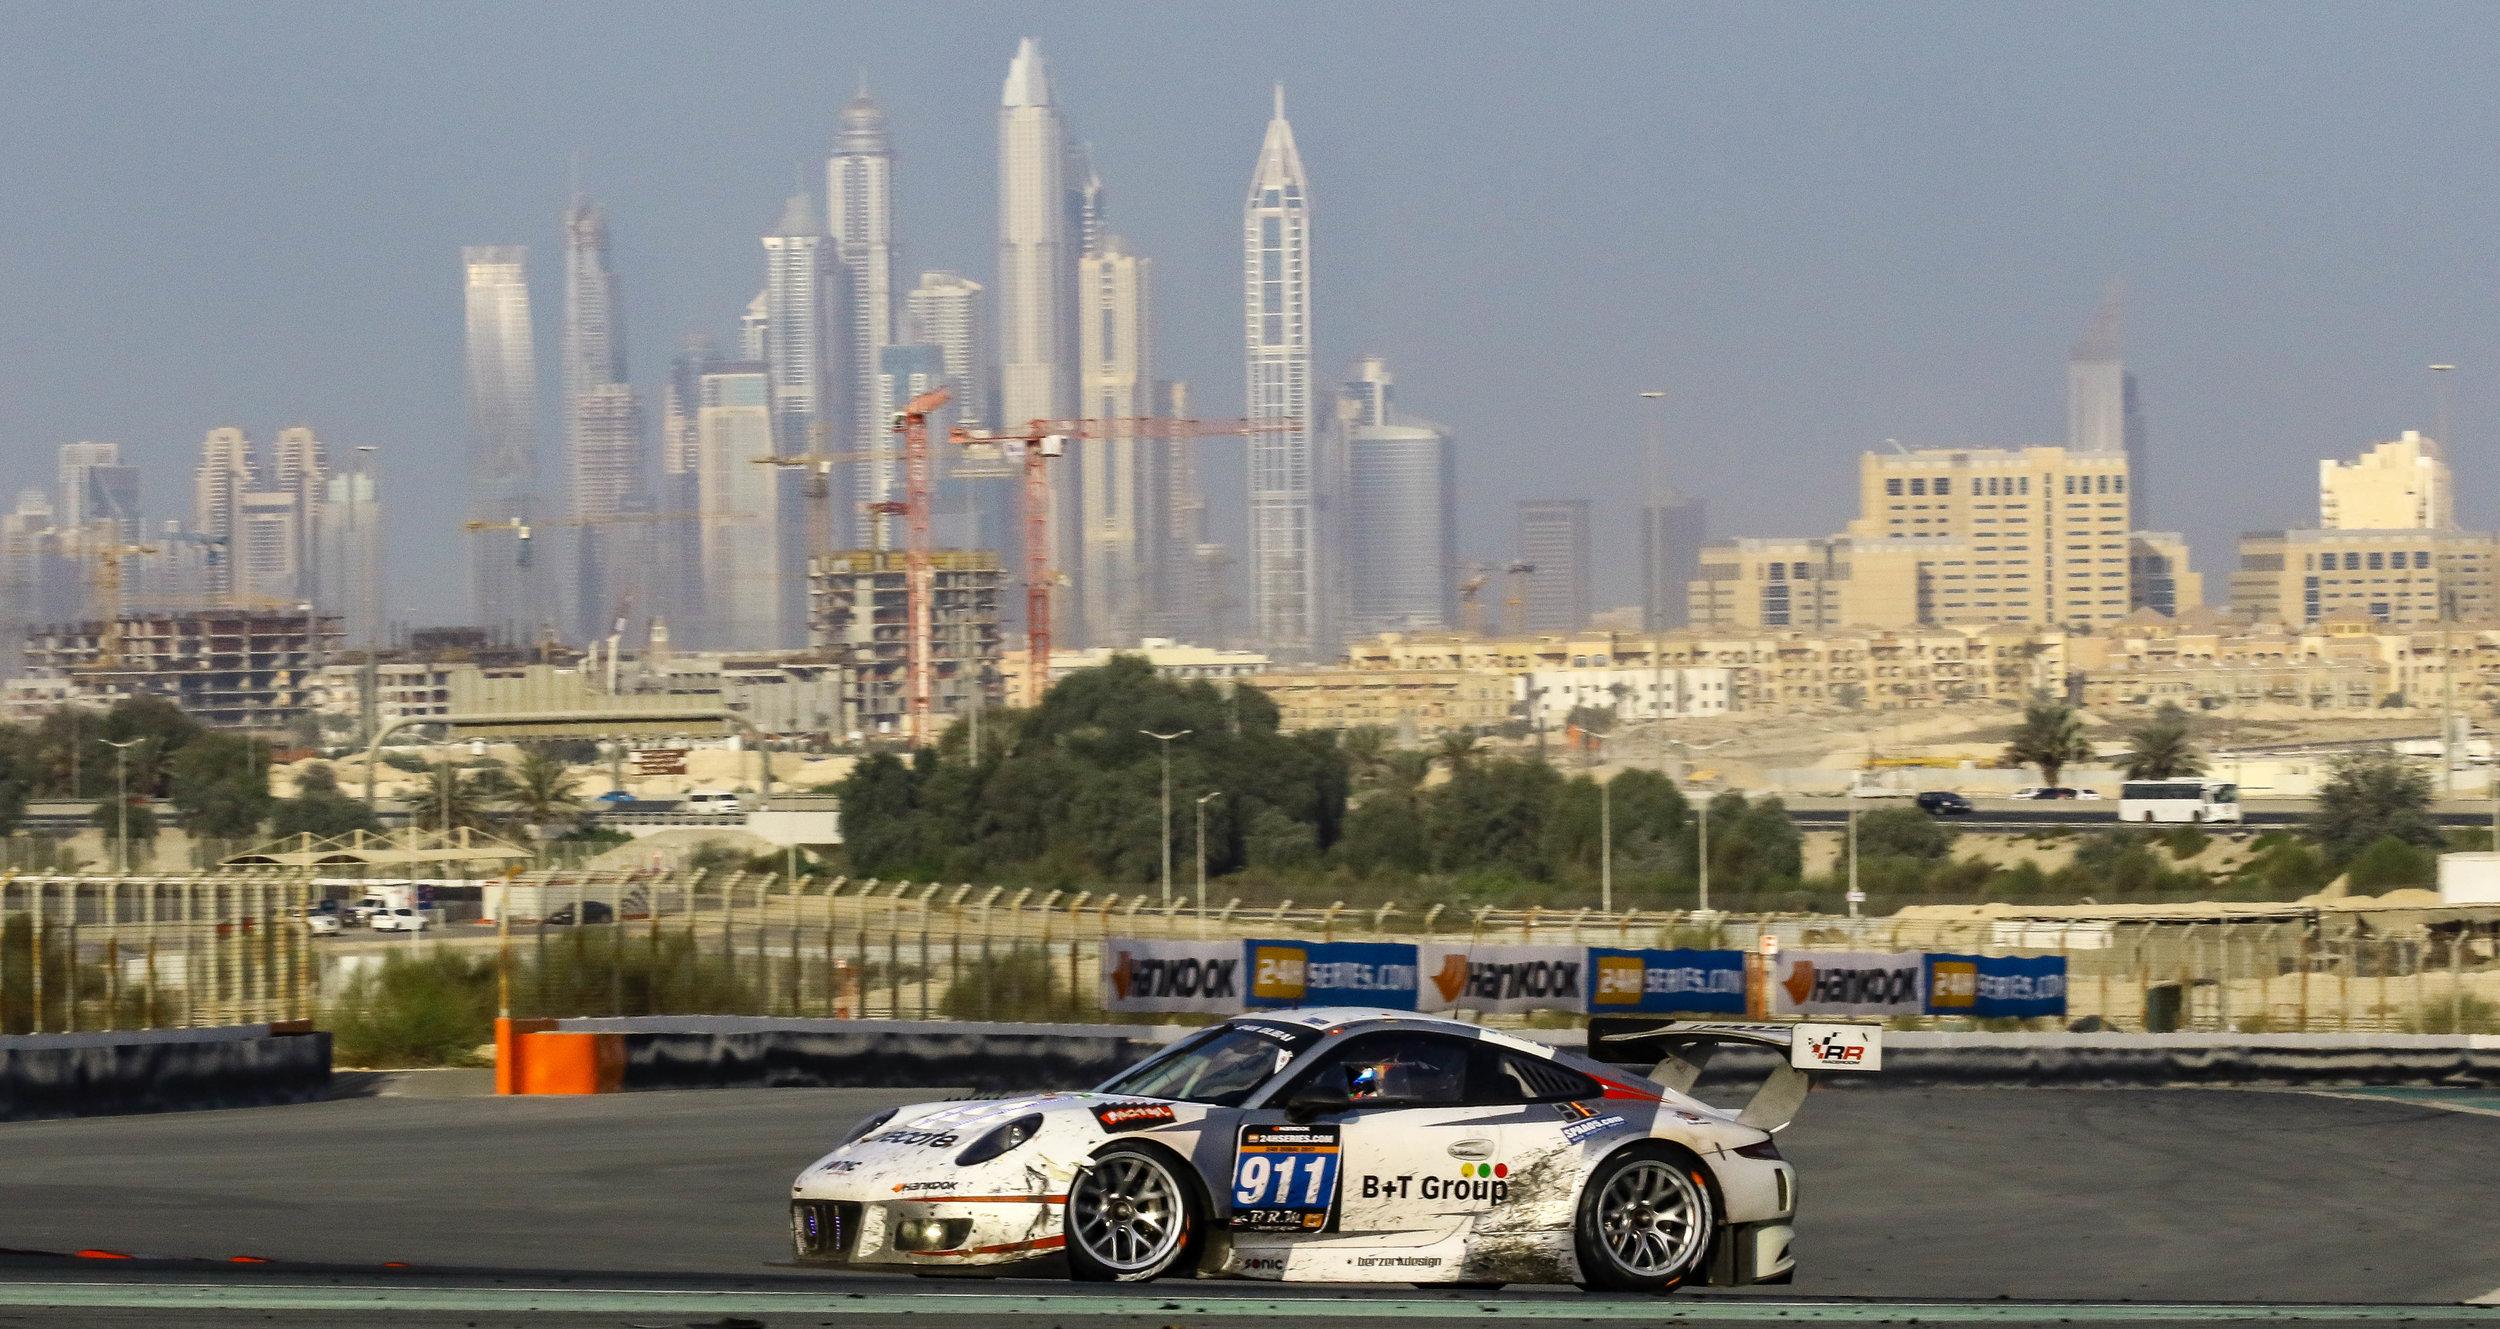 Hankook 24 hours of Dubai 2017